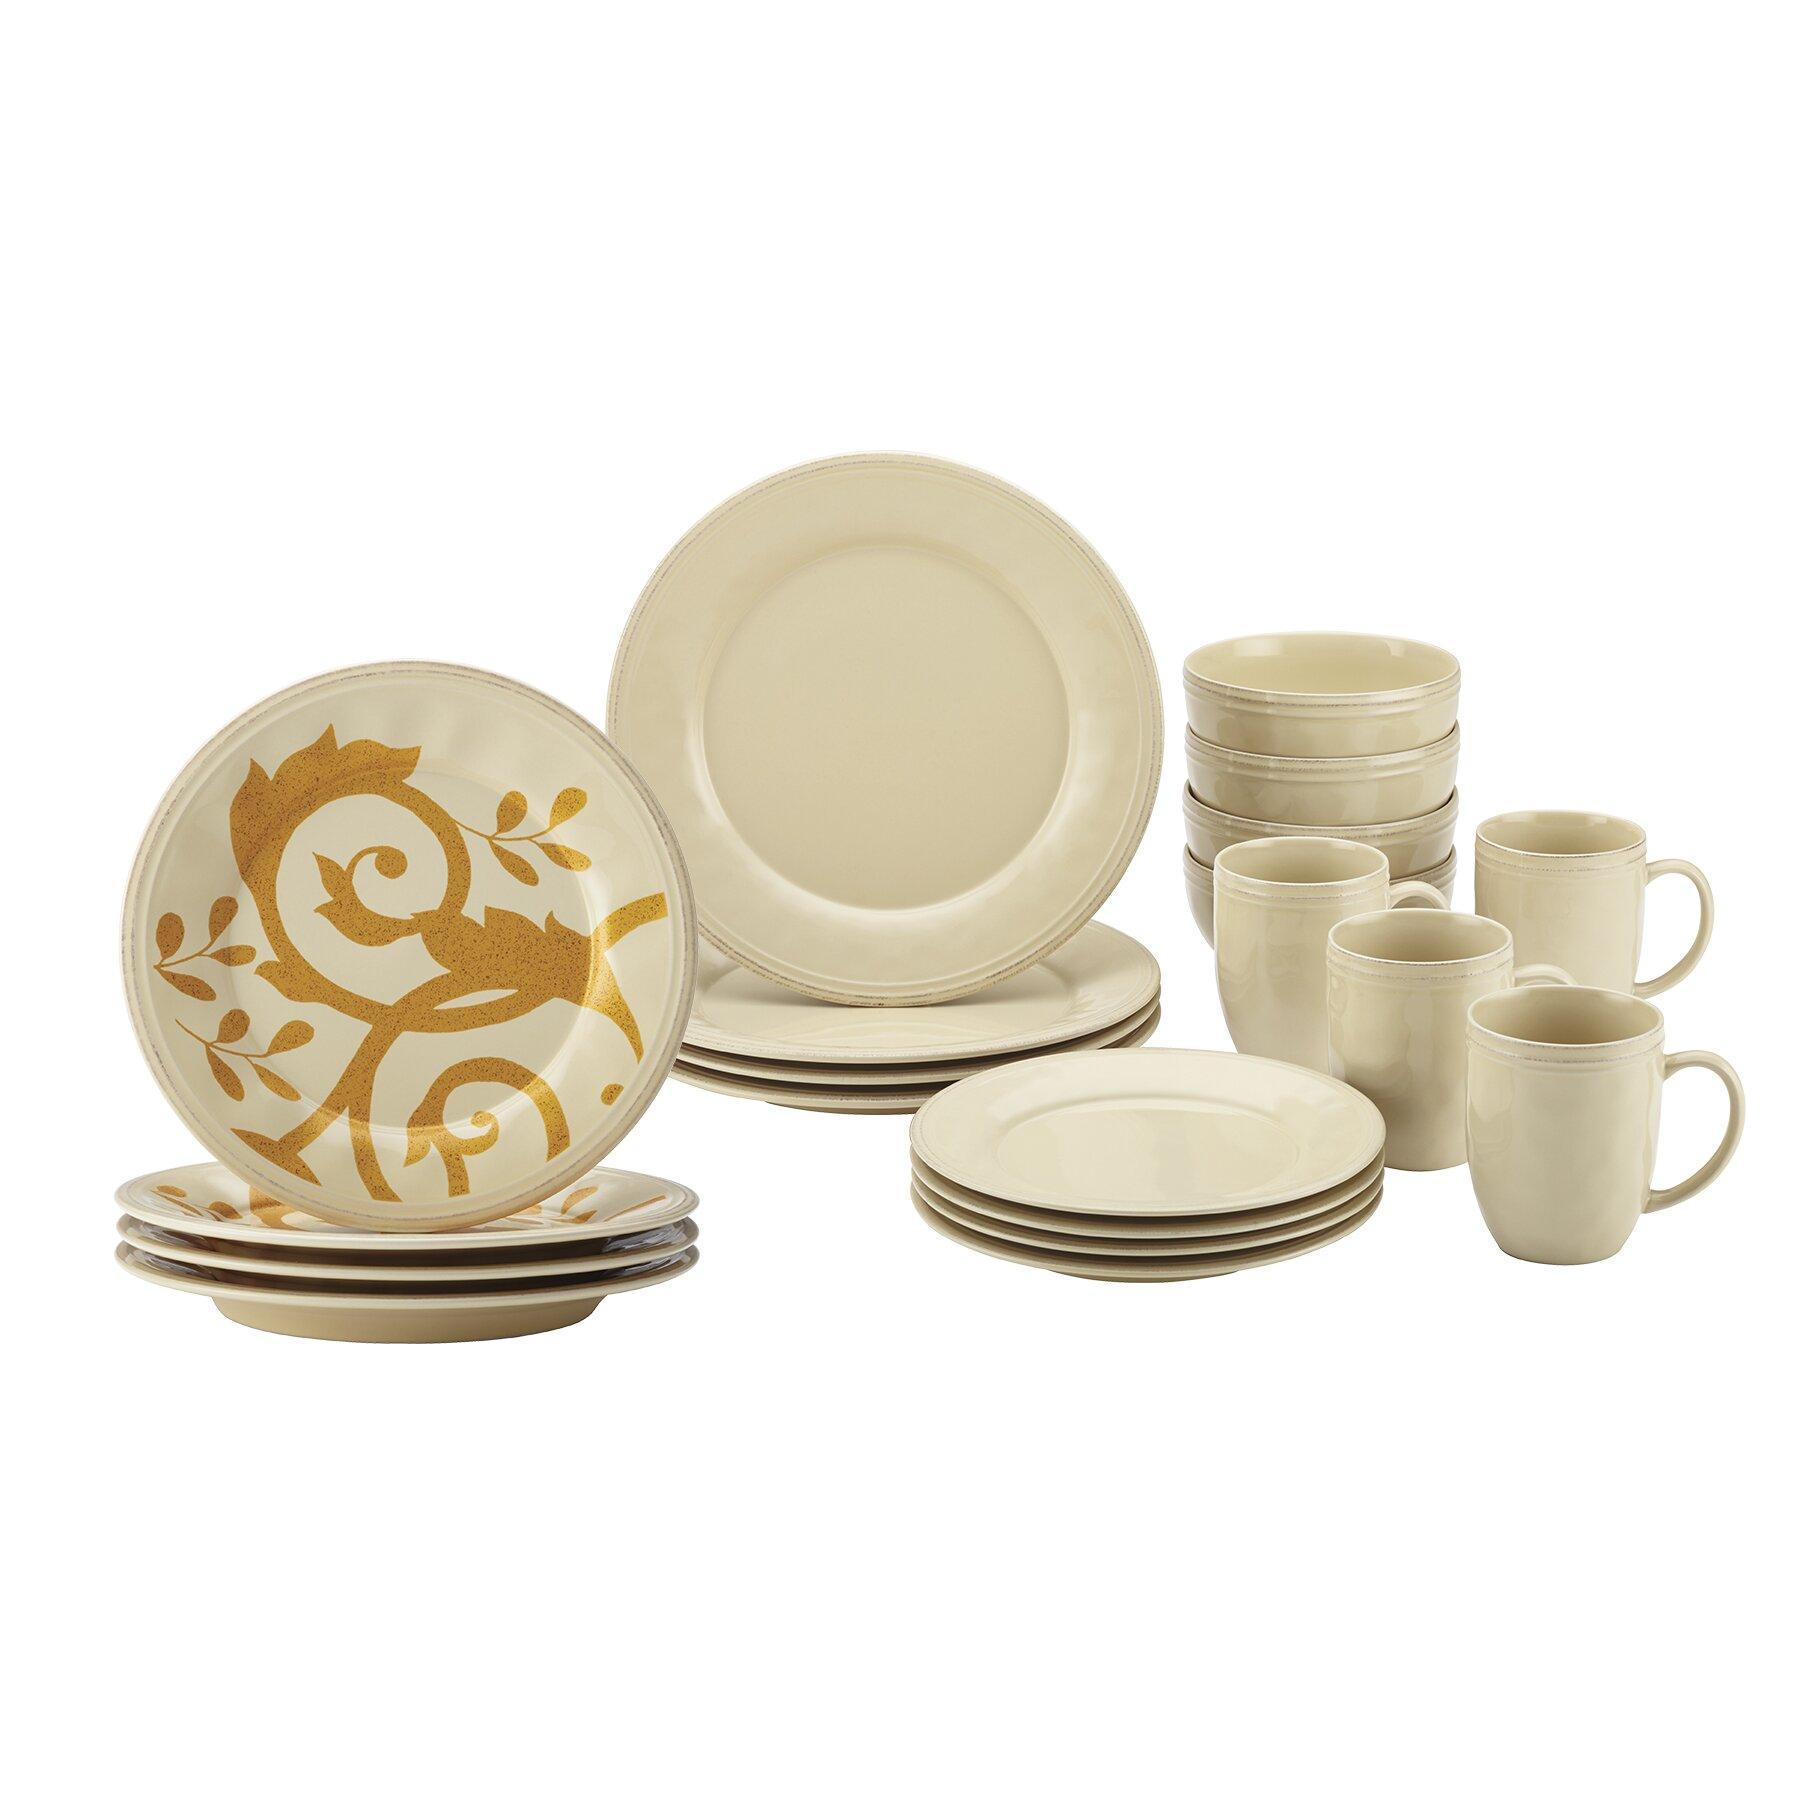 Rachael ray 20 piece dinnerware set wayfair